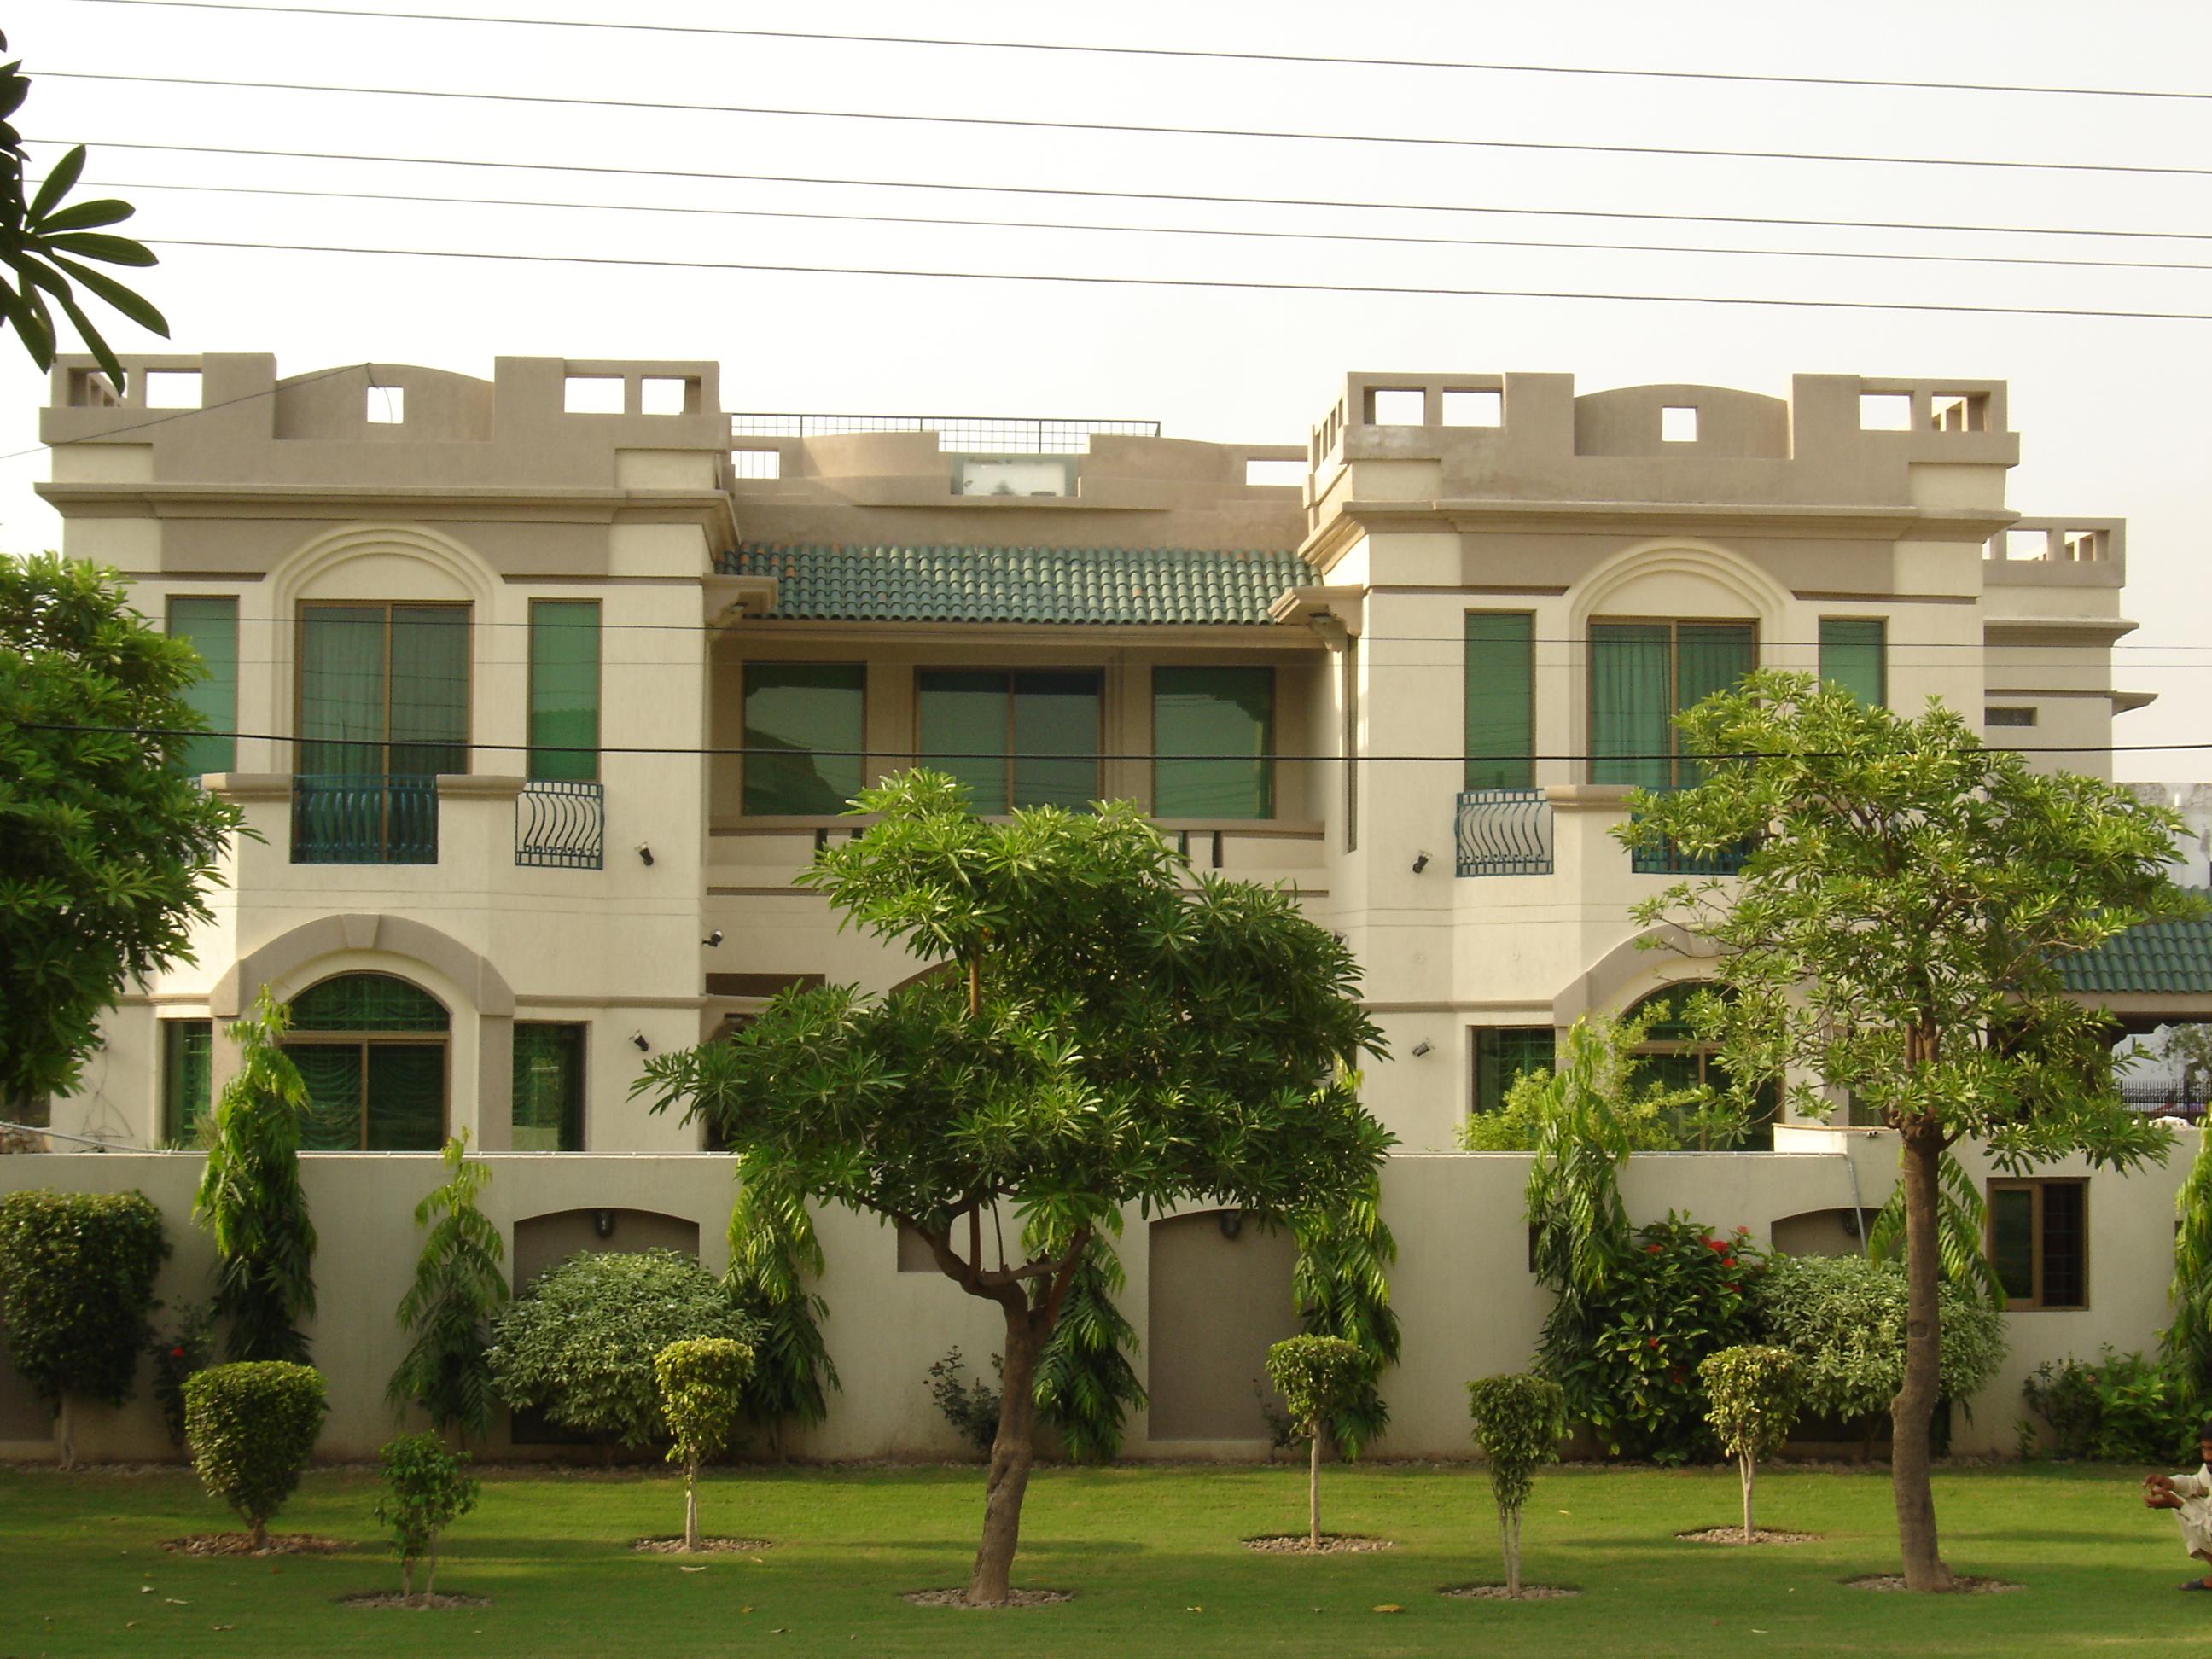 Stunning Modern Bungalow House Plans 2592 x 1944 · 2187 kB · jpeg